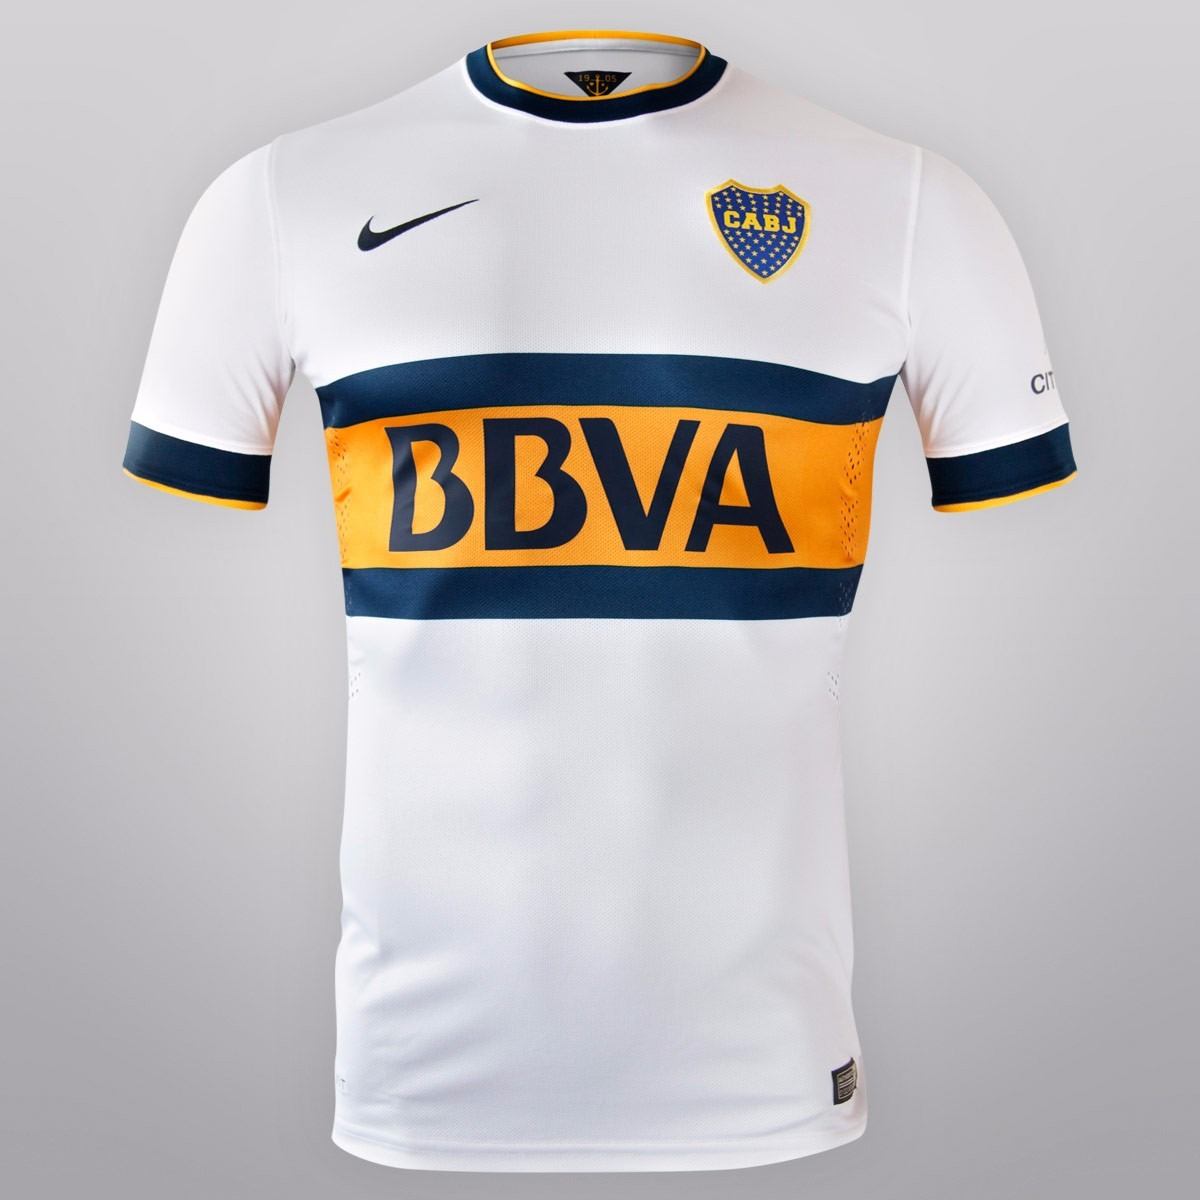 f2d6138a0bf2c Camiseta De Boca Juniors 2015 Titular Y Suplente Original!! -   550 .